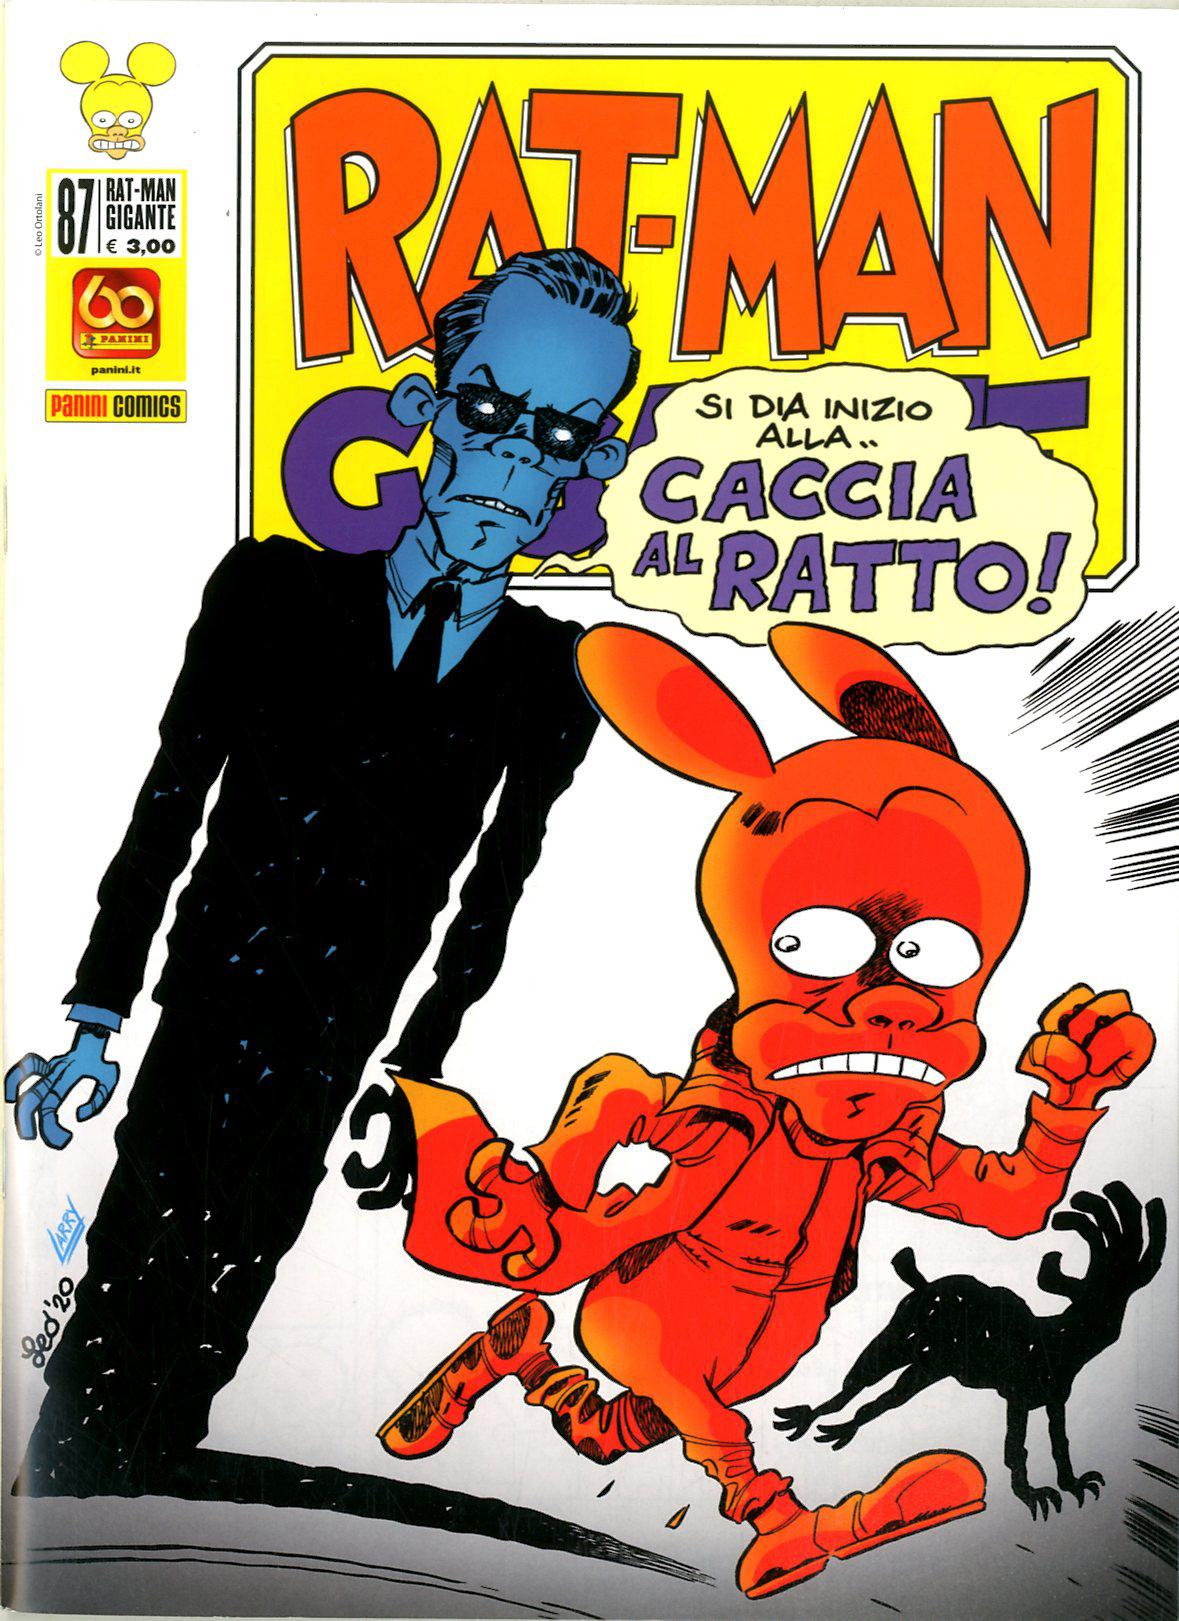 Fumetto – Panini Comics – Rat-Man Gigante #87